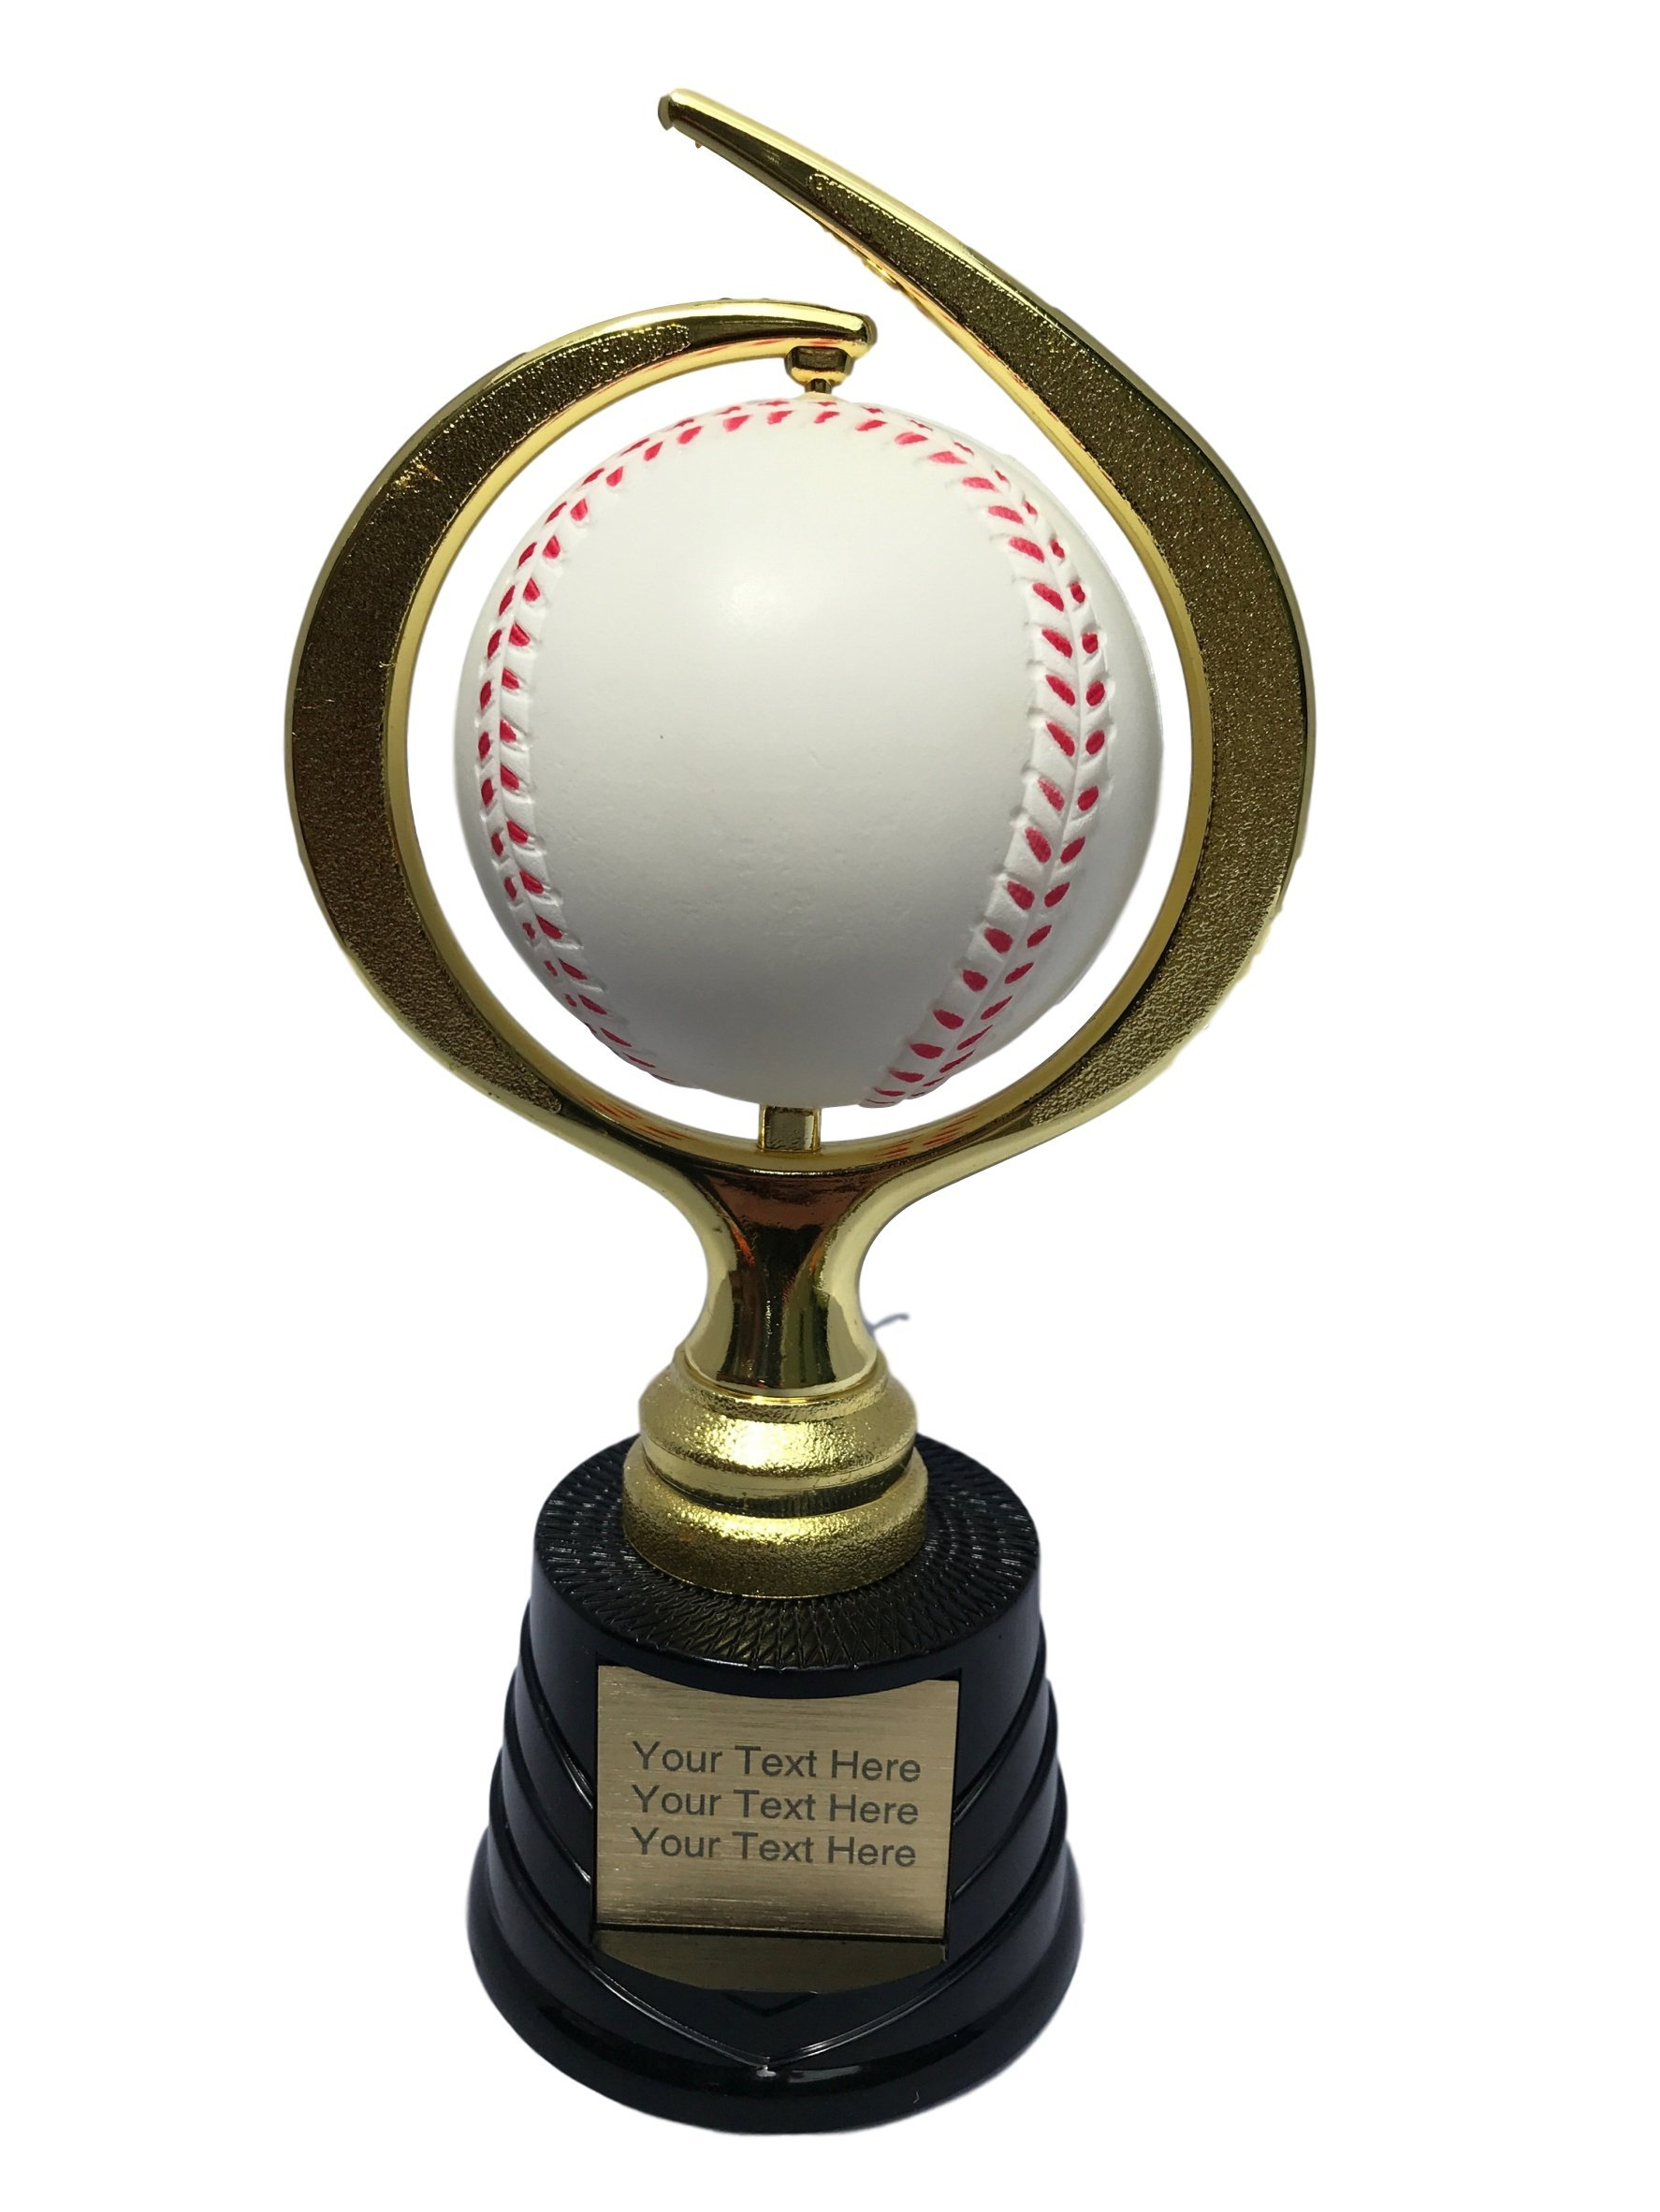 Trophy Crunch - Customized Baseball/Softball Trophies - Baseball Spinner - Free Plate Engraving